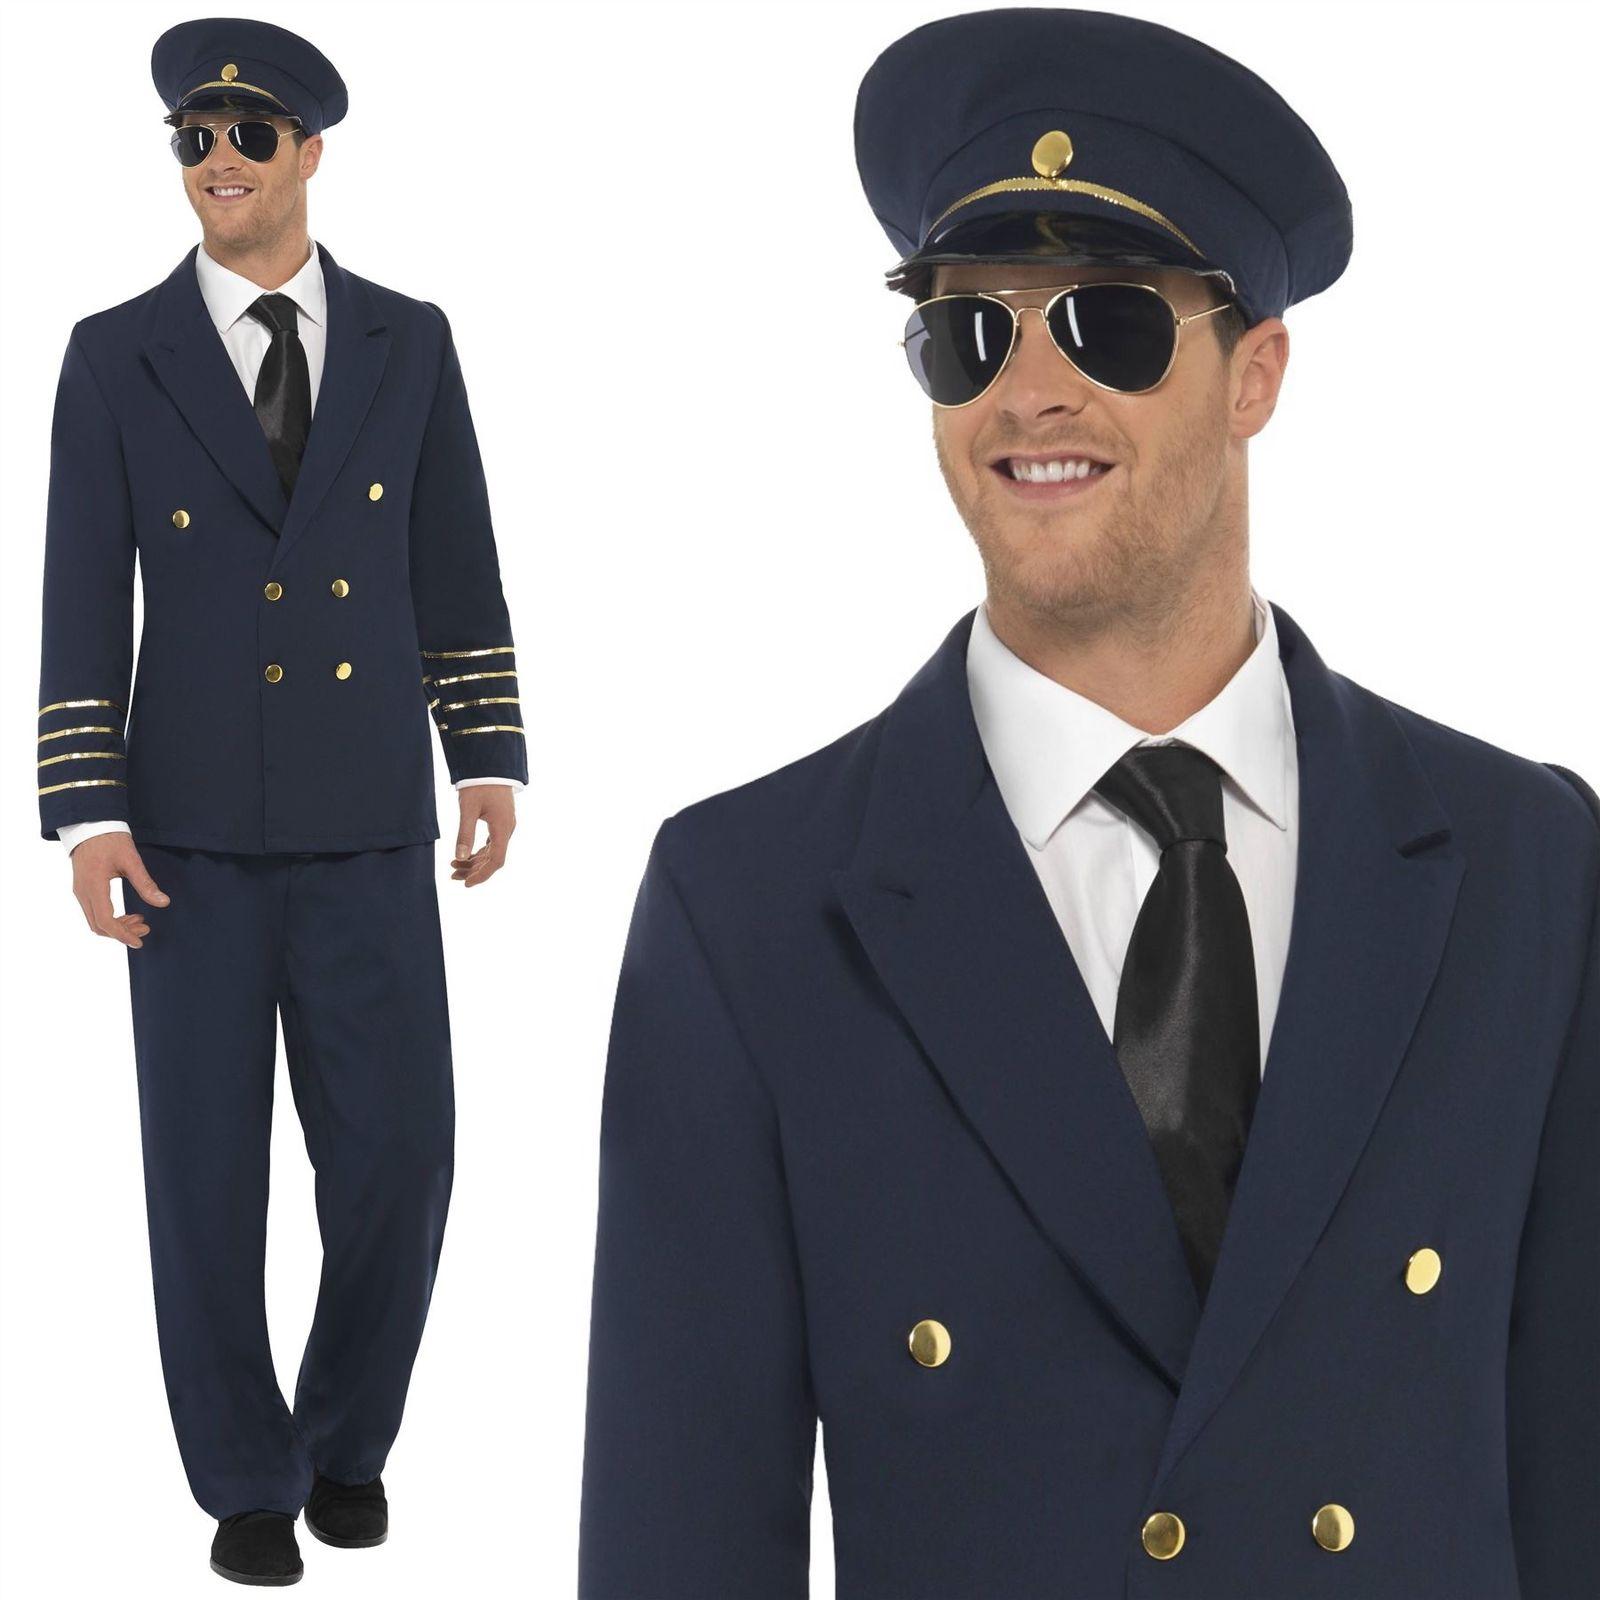 Top Gun Captain 80s Costume White Pilot Mens Fancy Dress Tom Cruise Outfit M L